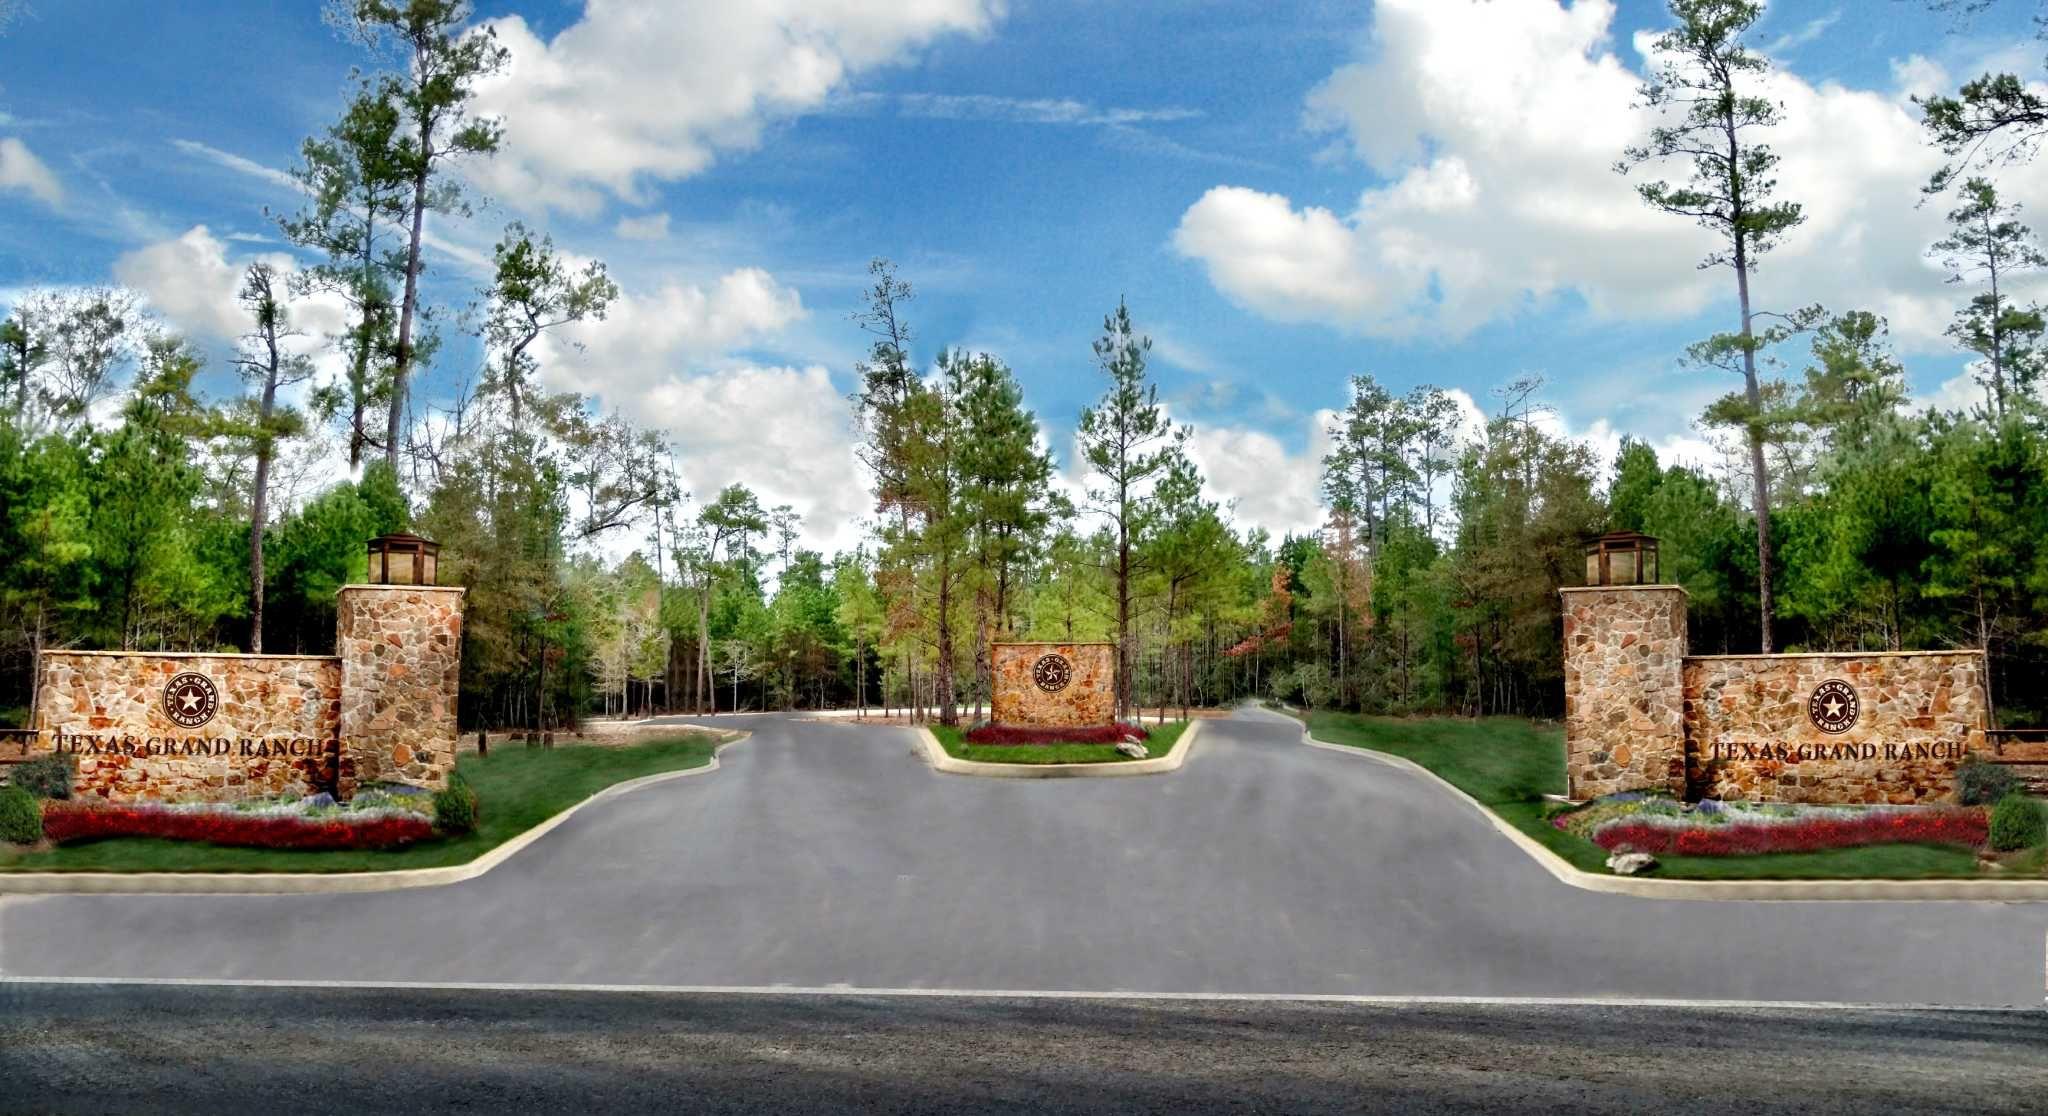 Texas Grand Ranch. Entry.jpg